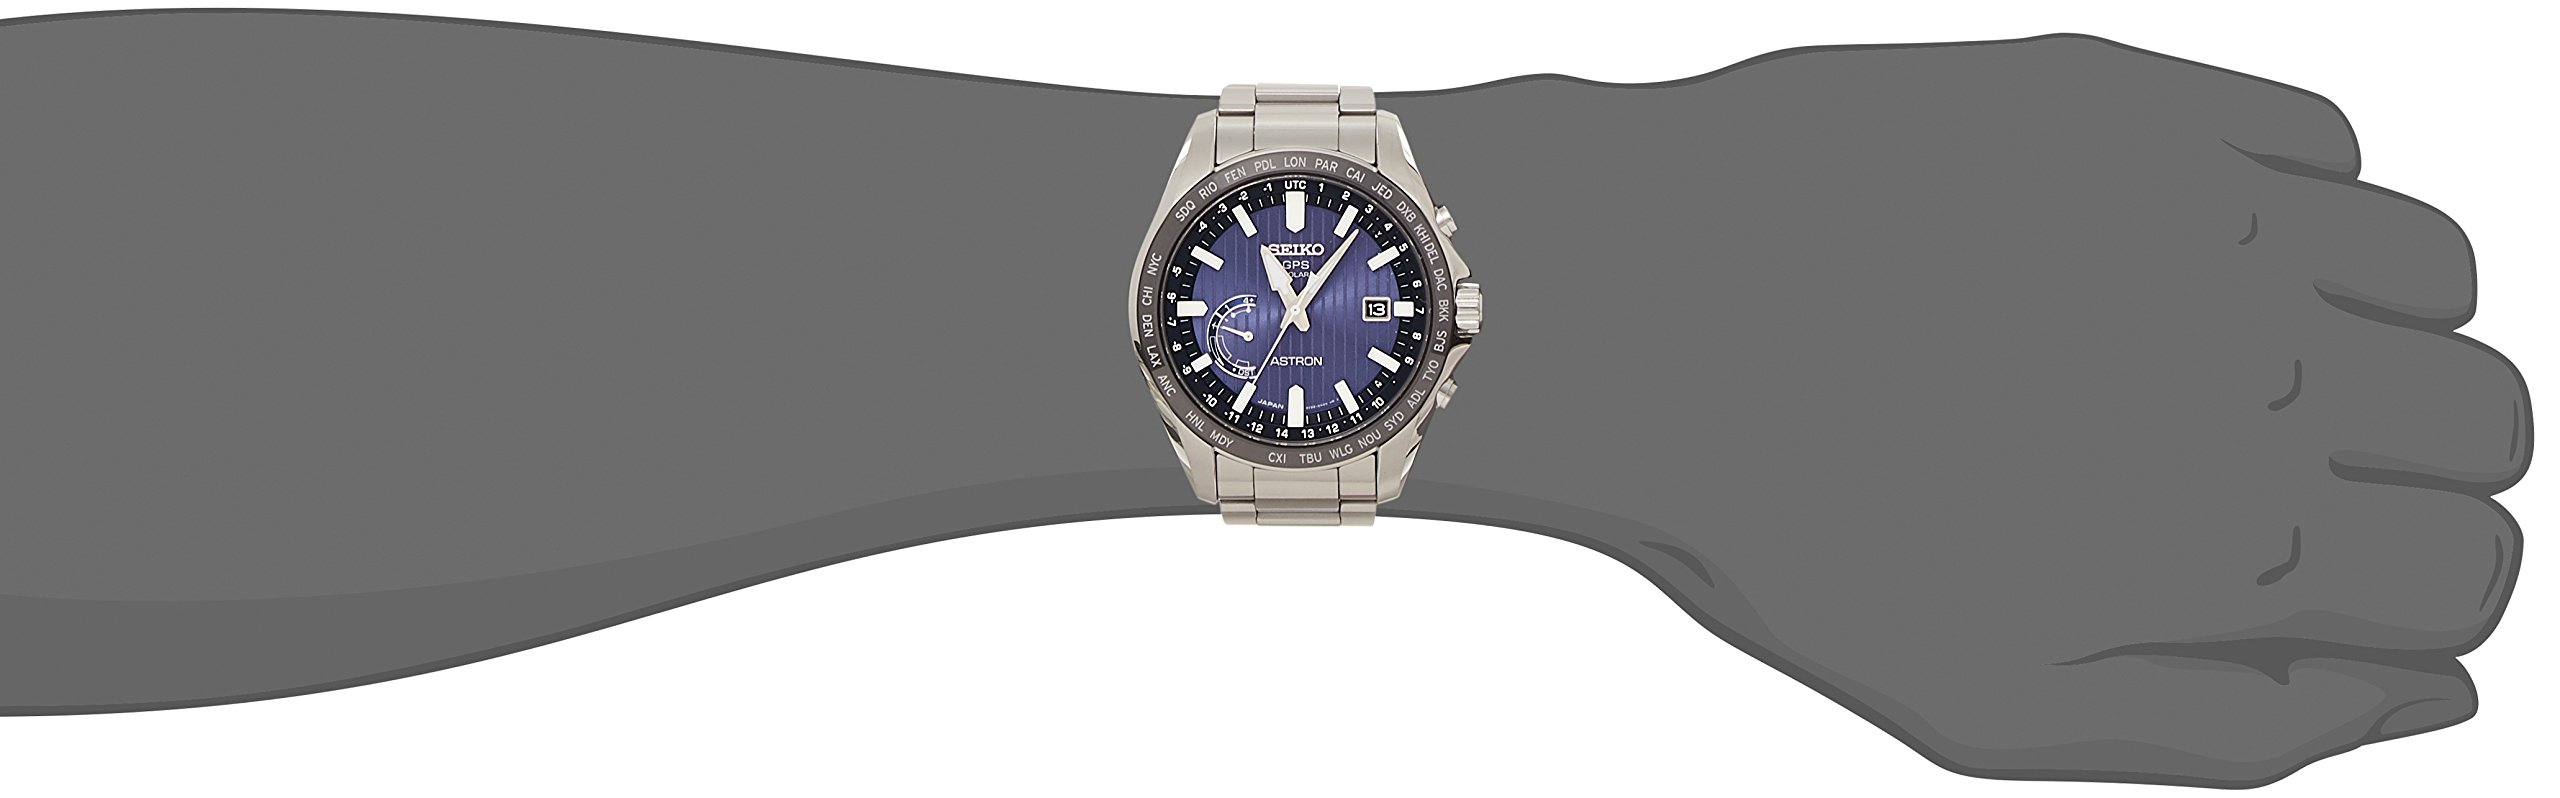 SEIKO Watch ASTRON GPS Solar Watch Striped Dial board SBXB159 Men's New Popularity